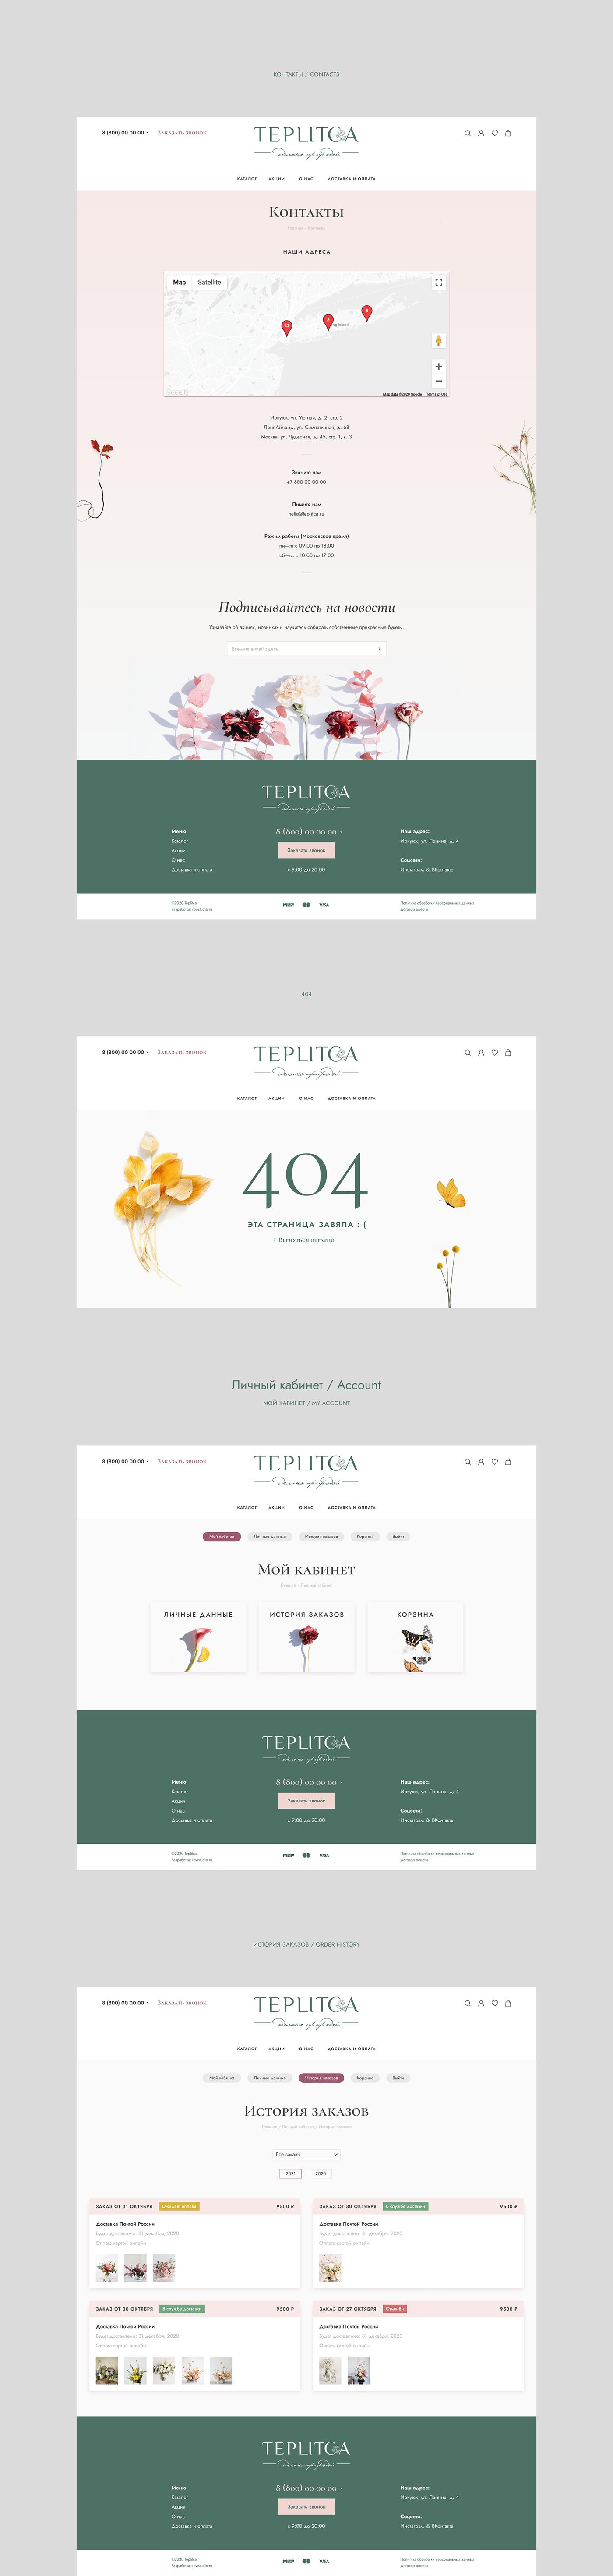 bitrix e-commerce florist online shop store UI / UX Webdesign Битрикс